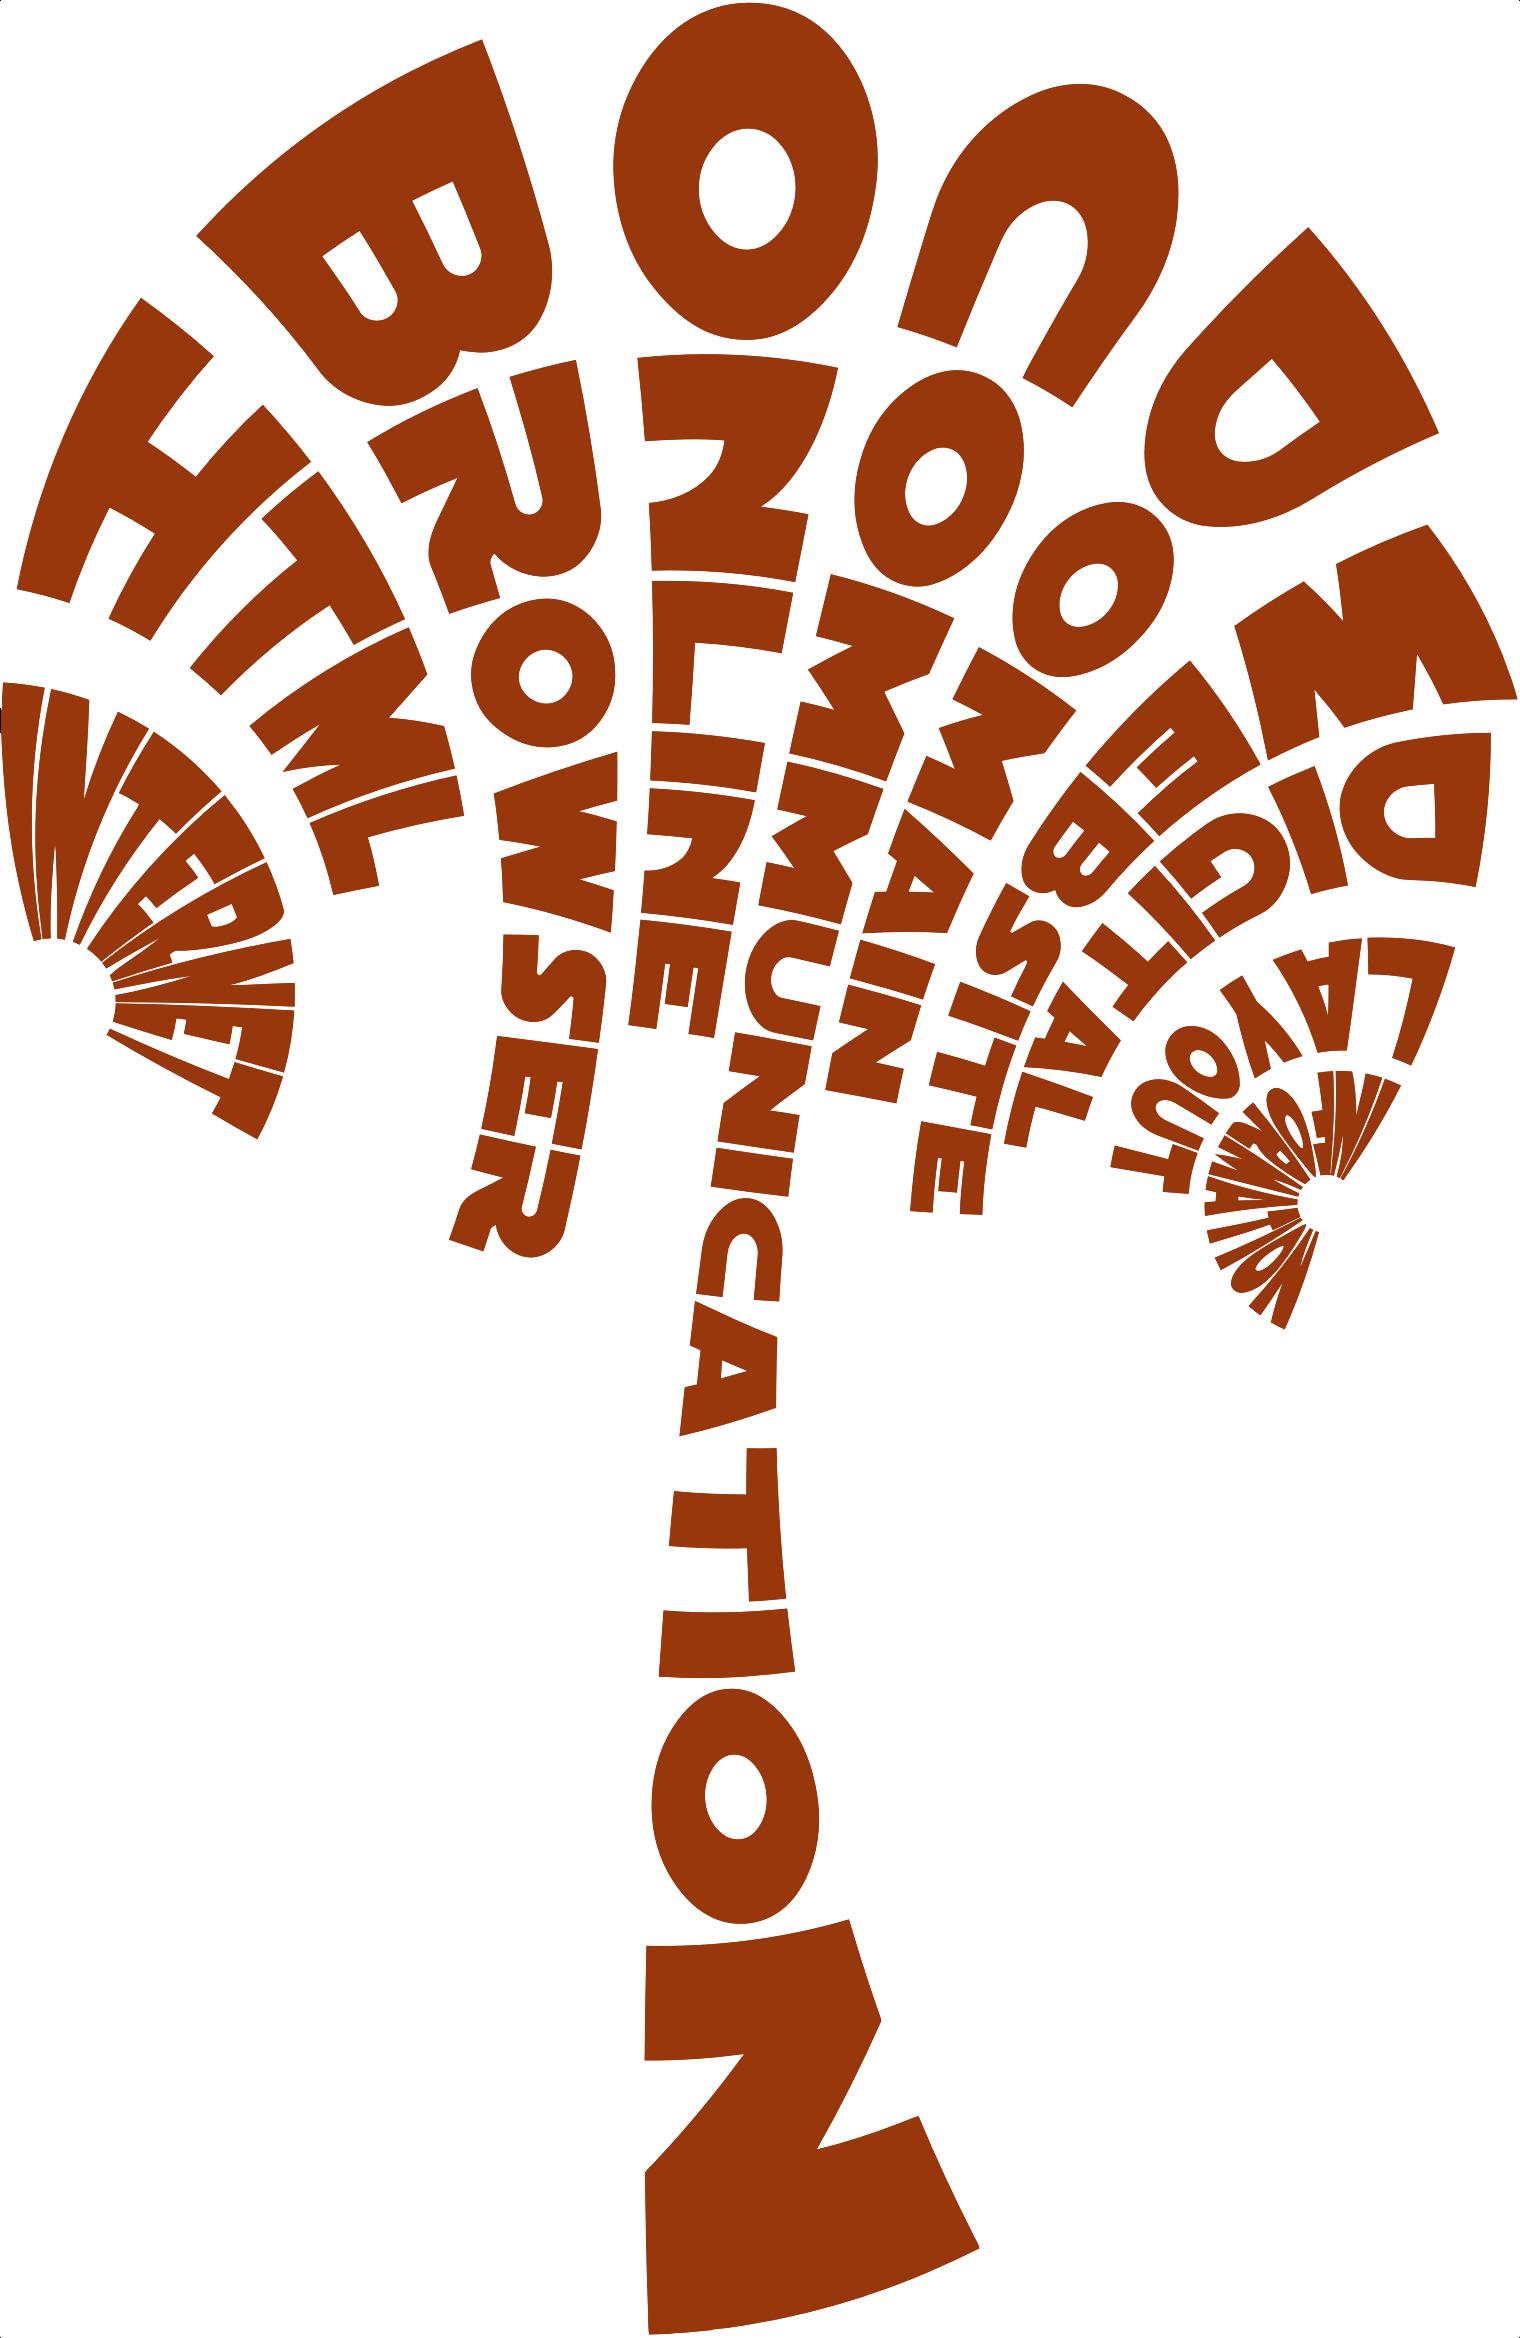 clipart web tree typography microsoft office online clipart and media microsoft office online clip art free